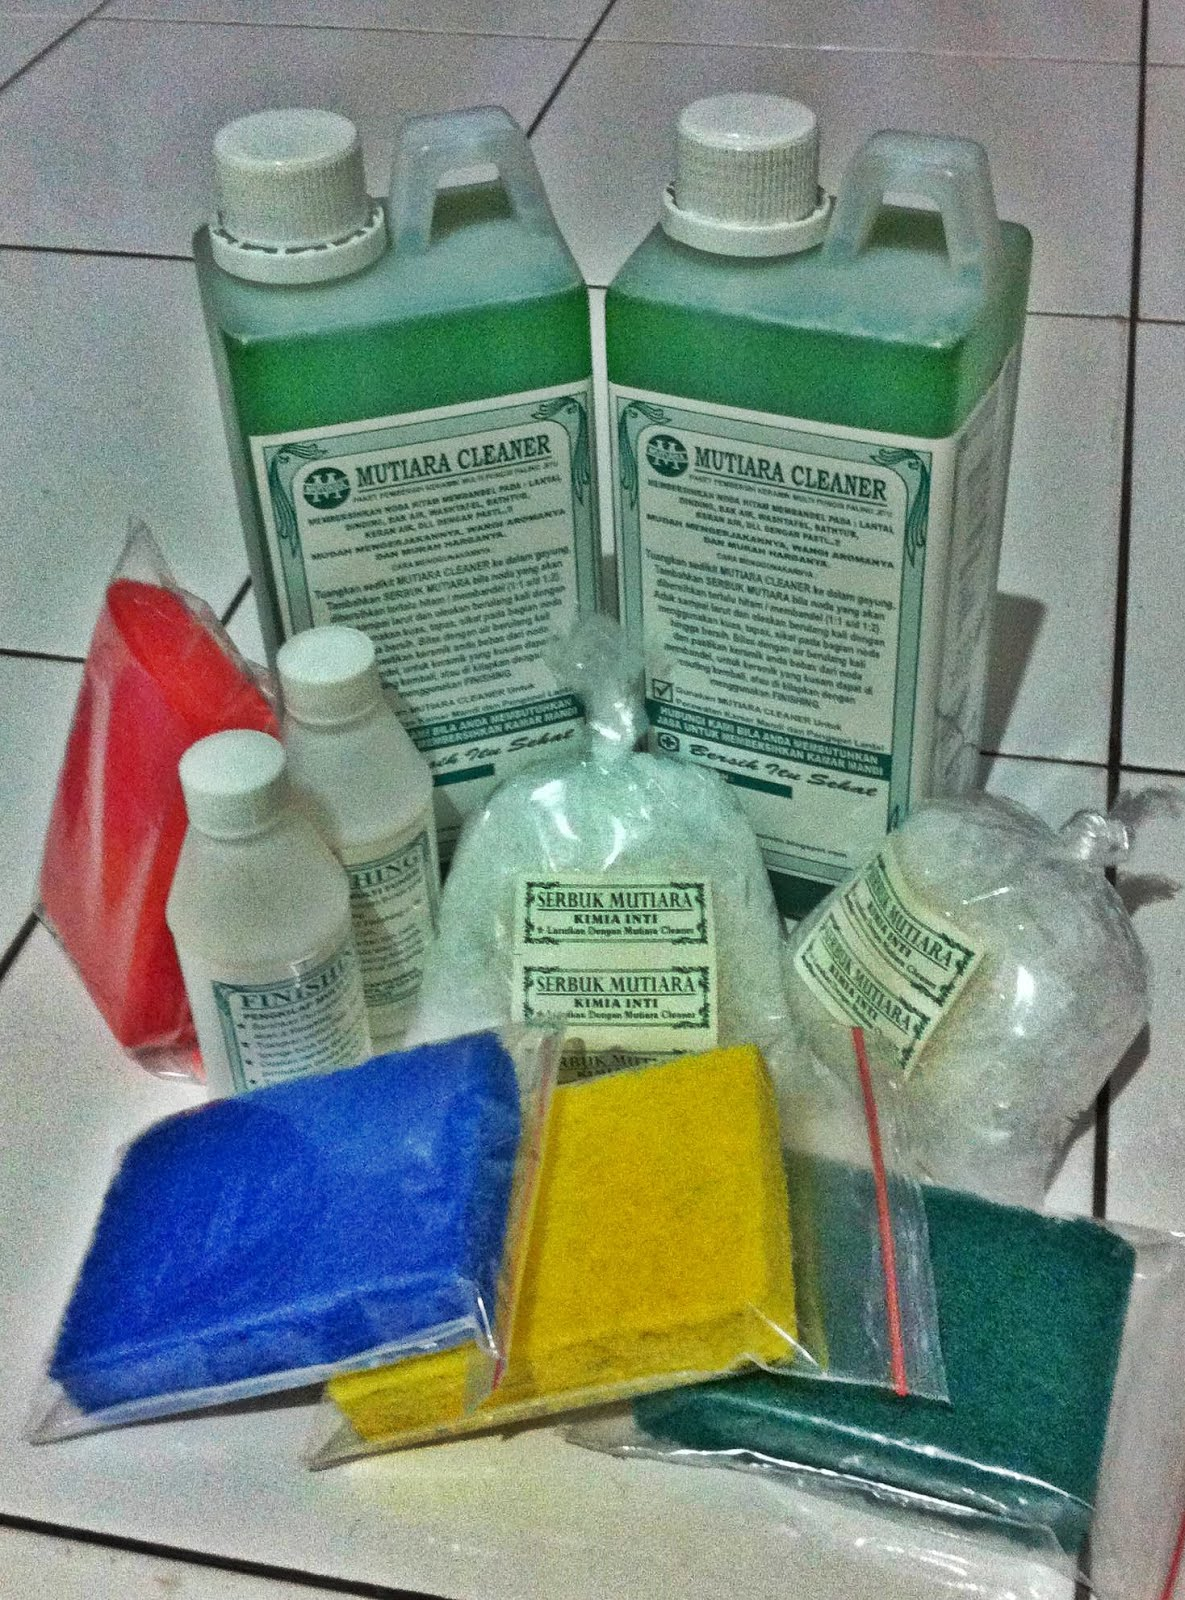 Paket Mutiara Cleaner  Harga Tebal Rp 142.500,-/ Paket  serba satu